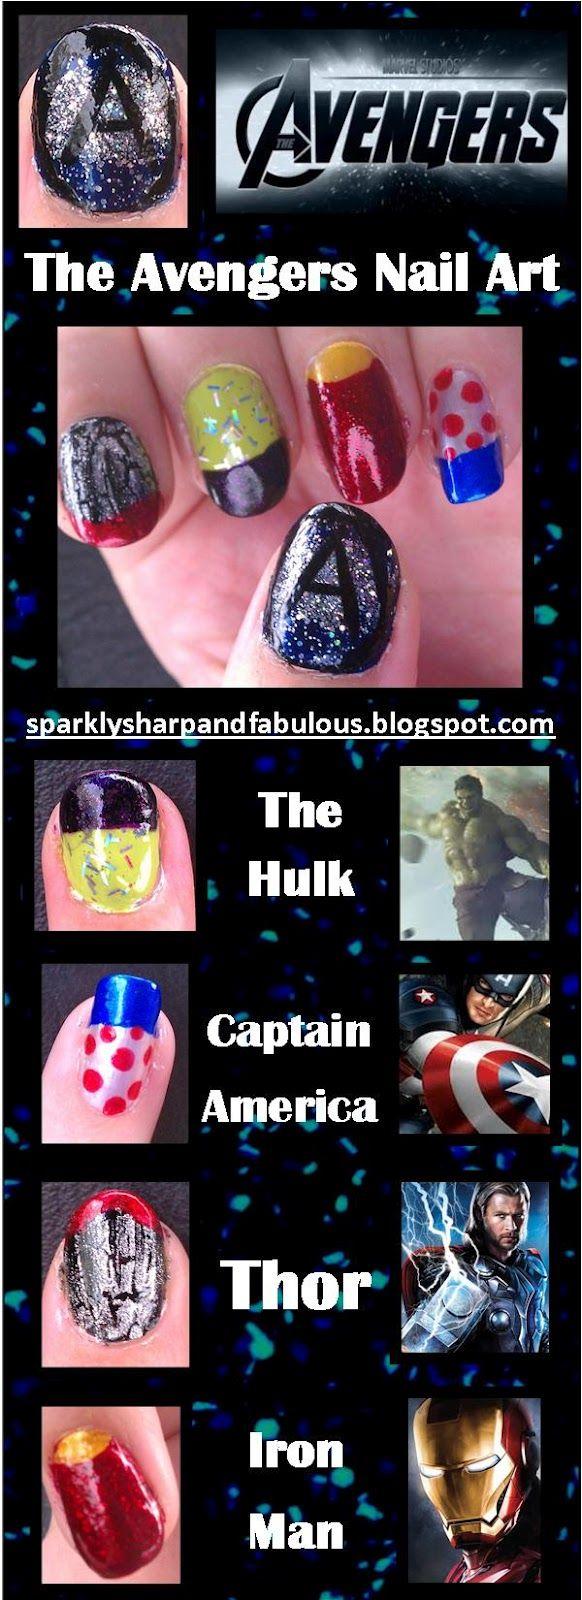 The Sparkle Queen: Nail Art http://sparklysharpandfabulous.blogspot.com/p/nail-art.html